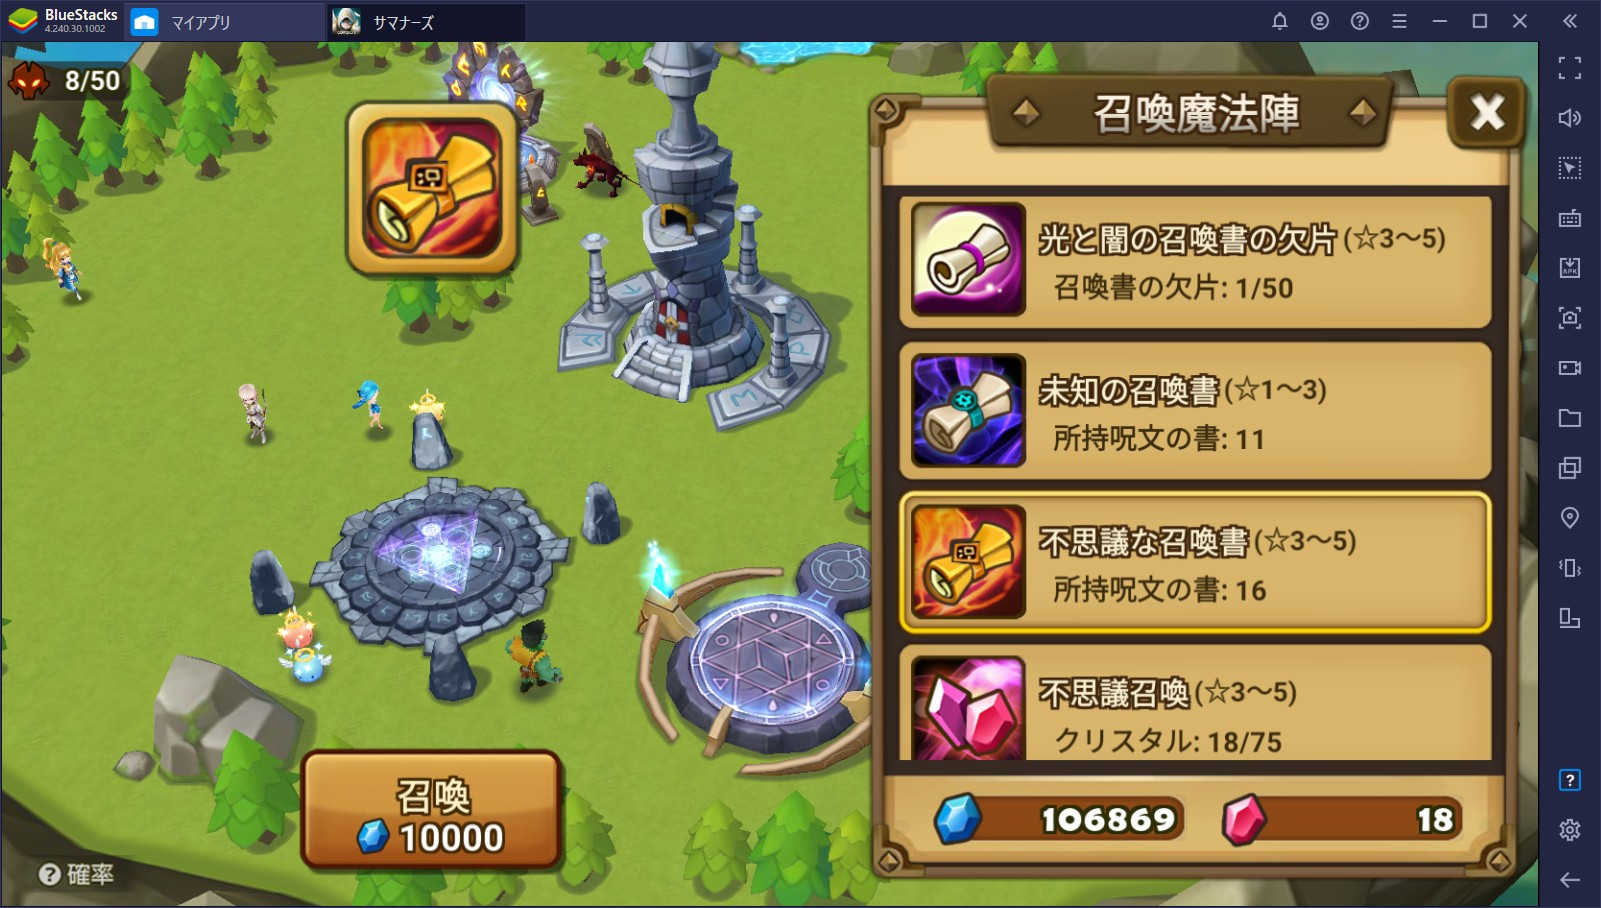 BlueStacks:『サマナーズウォー: Sky Arena』の基本的な遊び方と序盤のレベル上げ方法